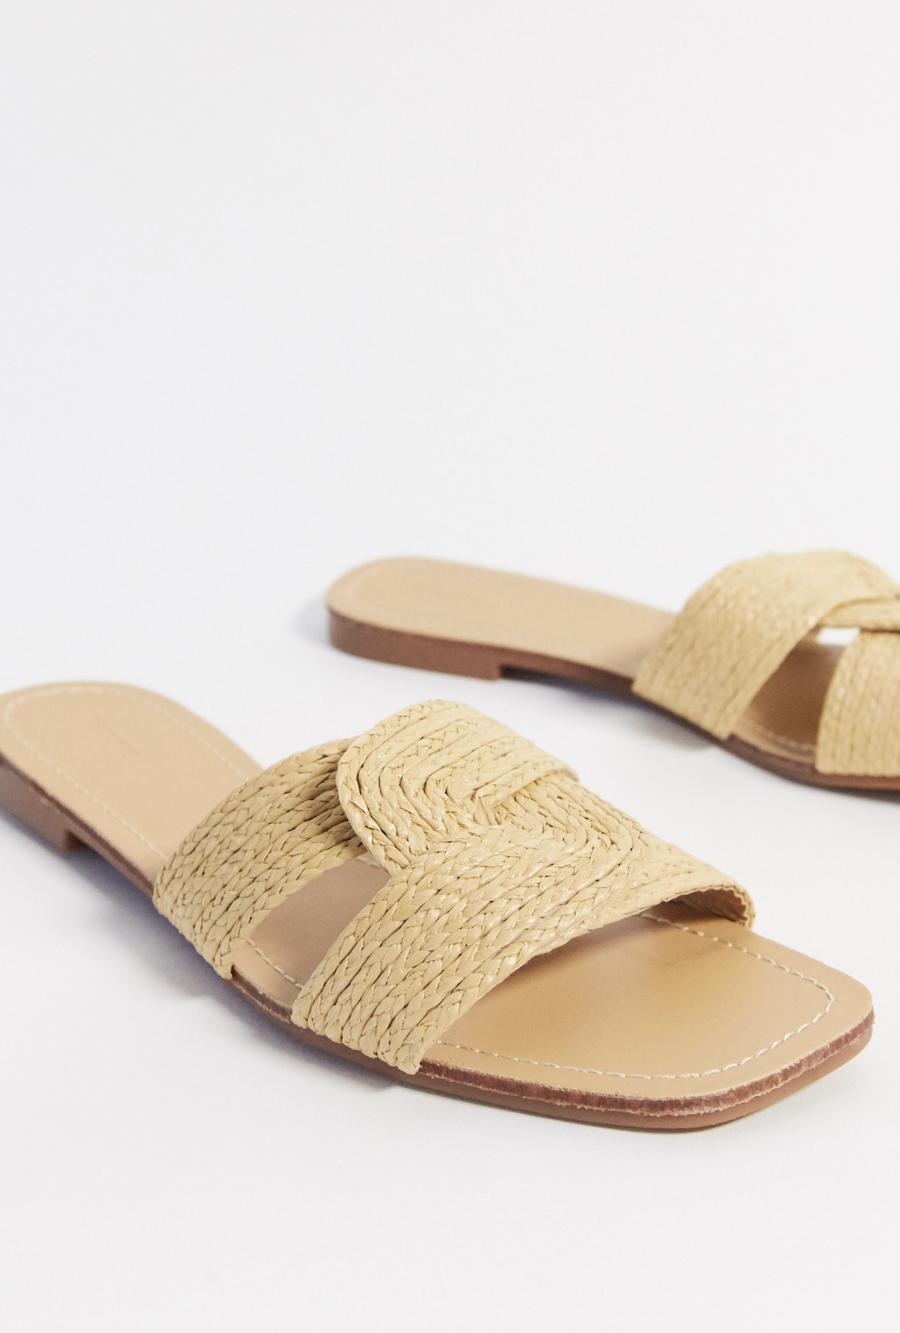 Sandalias planas de ratán en tono natural de Pimkie